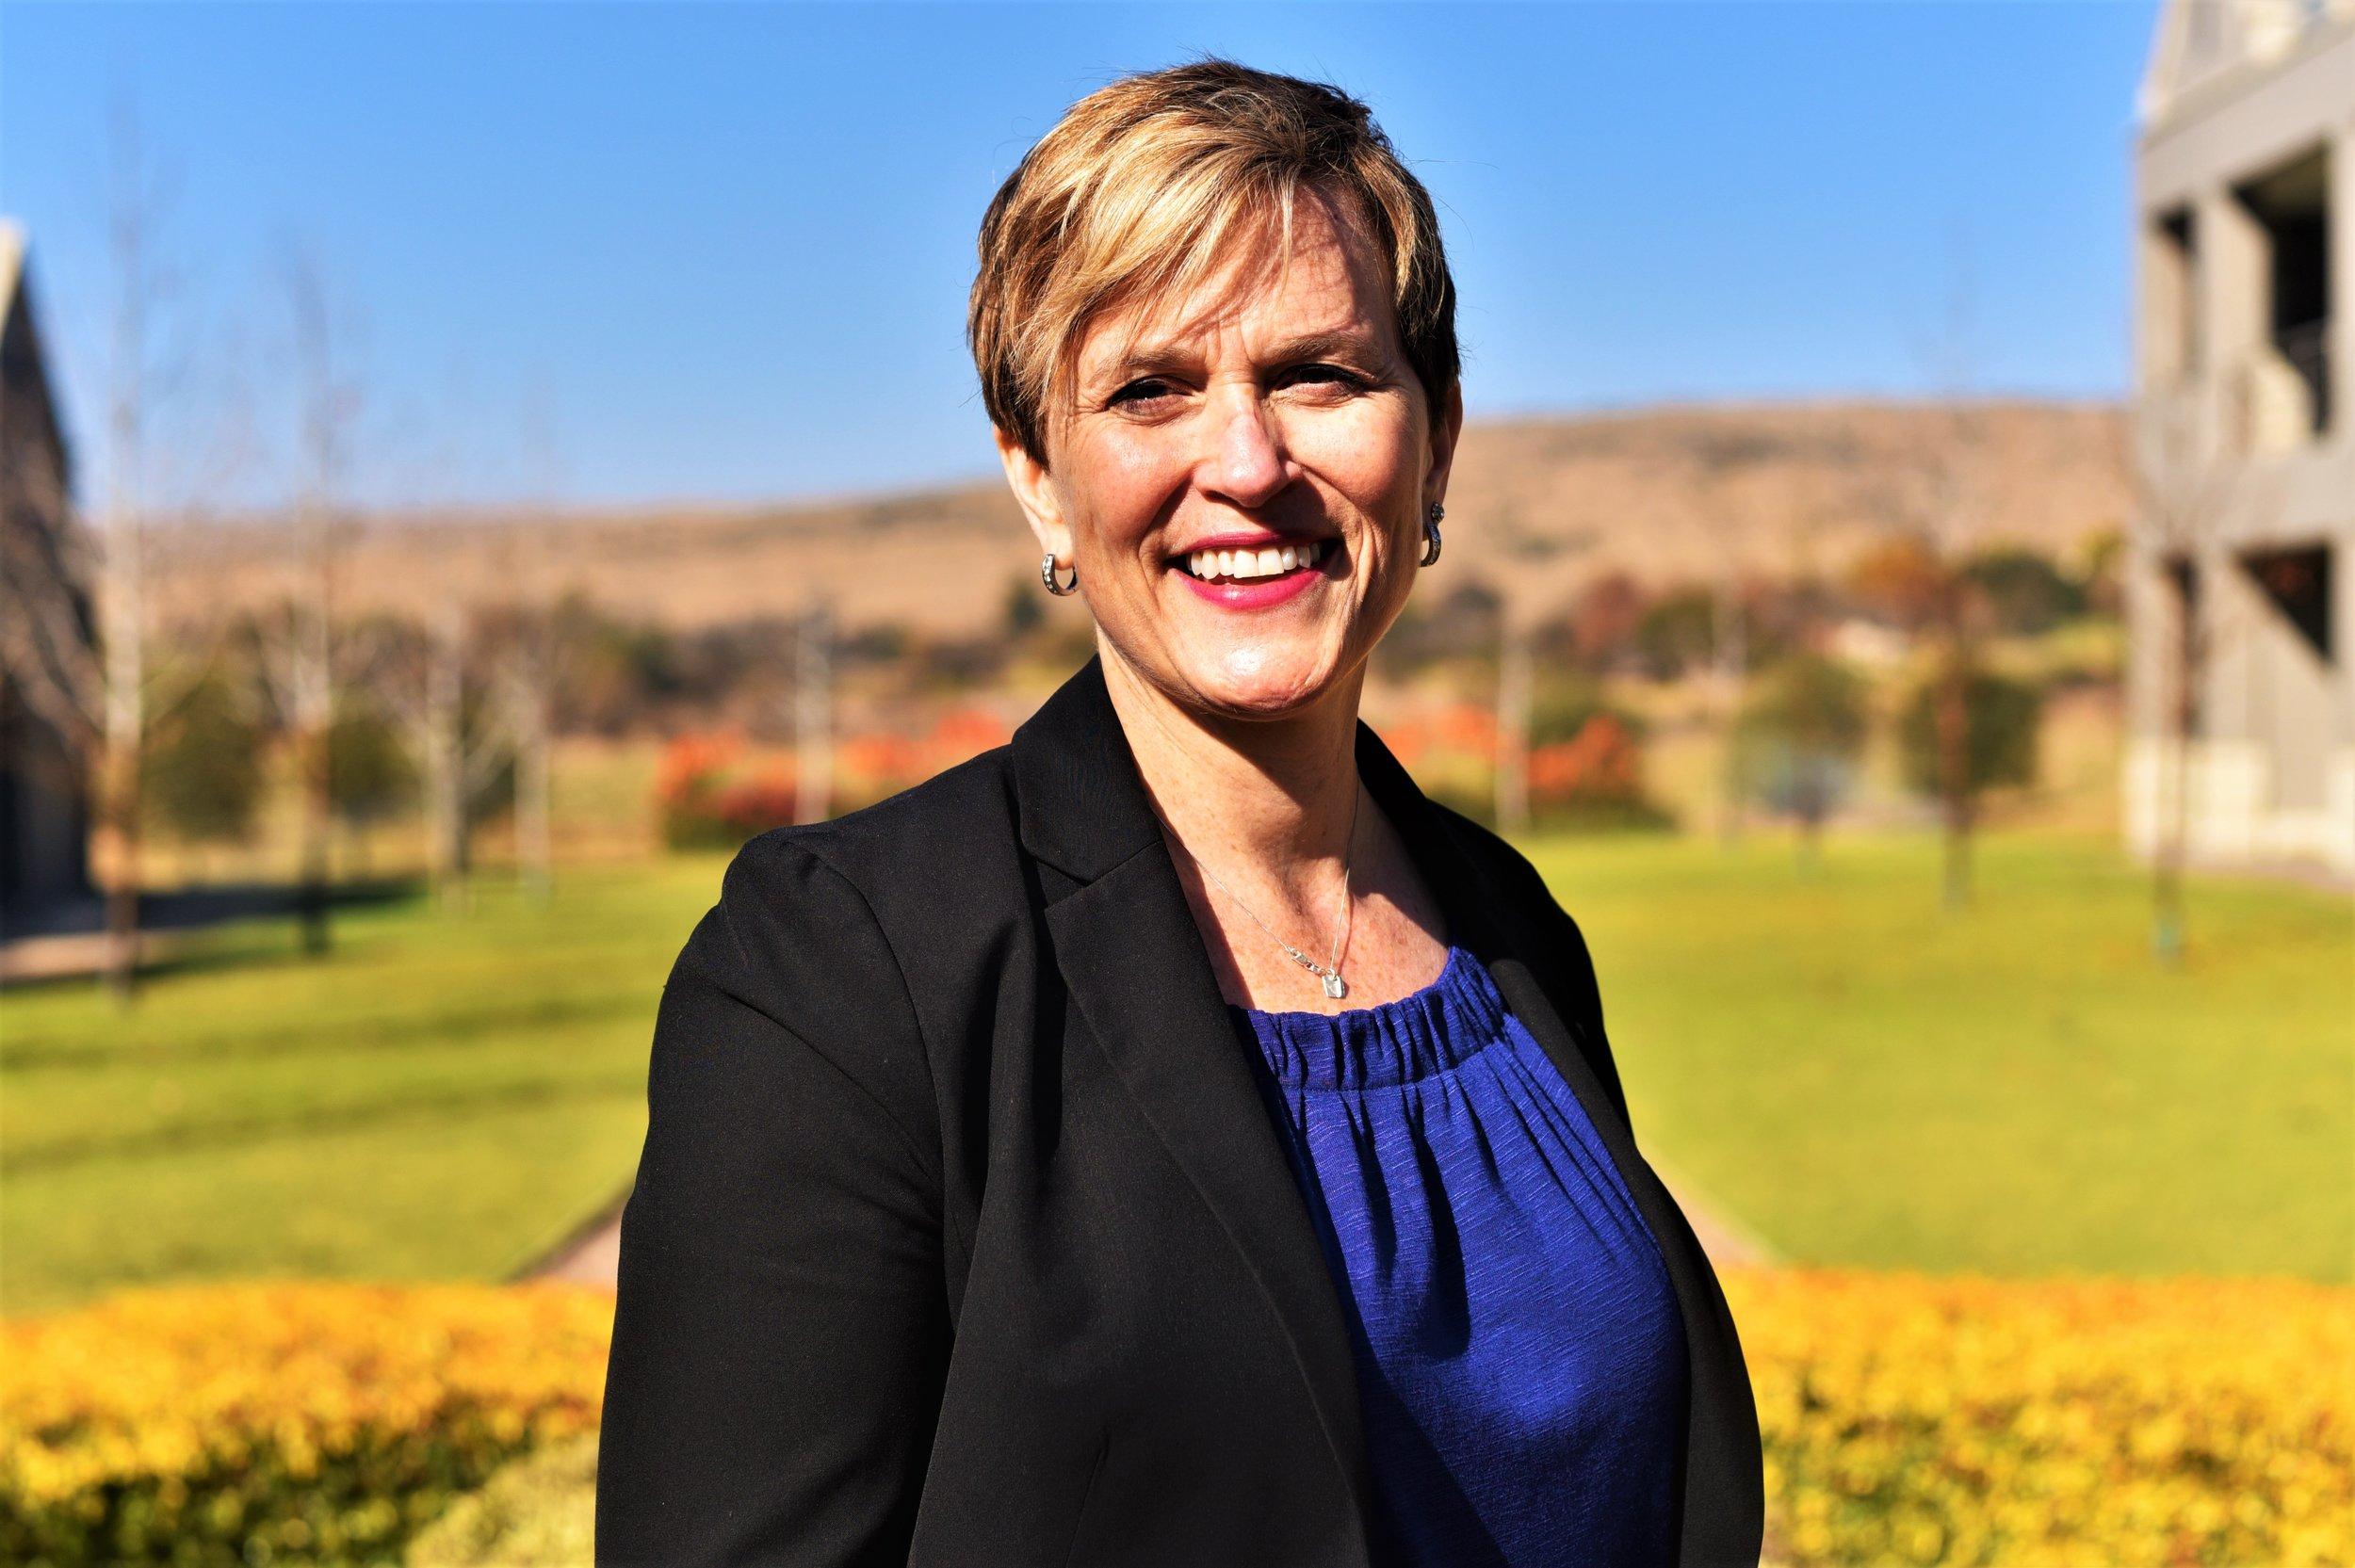 Betsy Hodges | the 47th Mayor of Minneapolis, Minnesota (@betsyhodges)